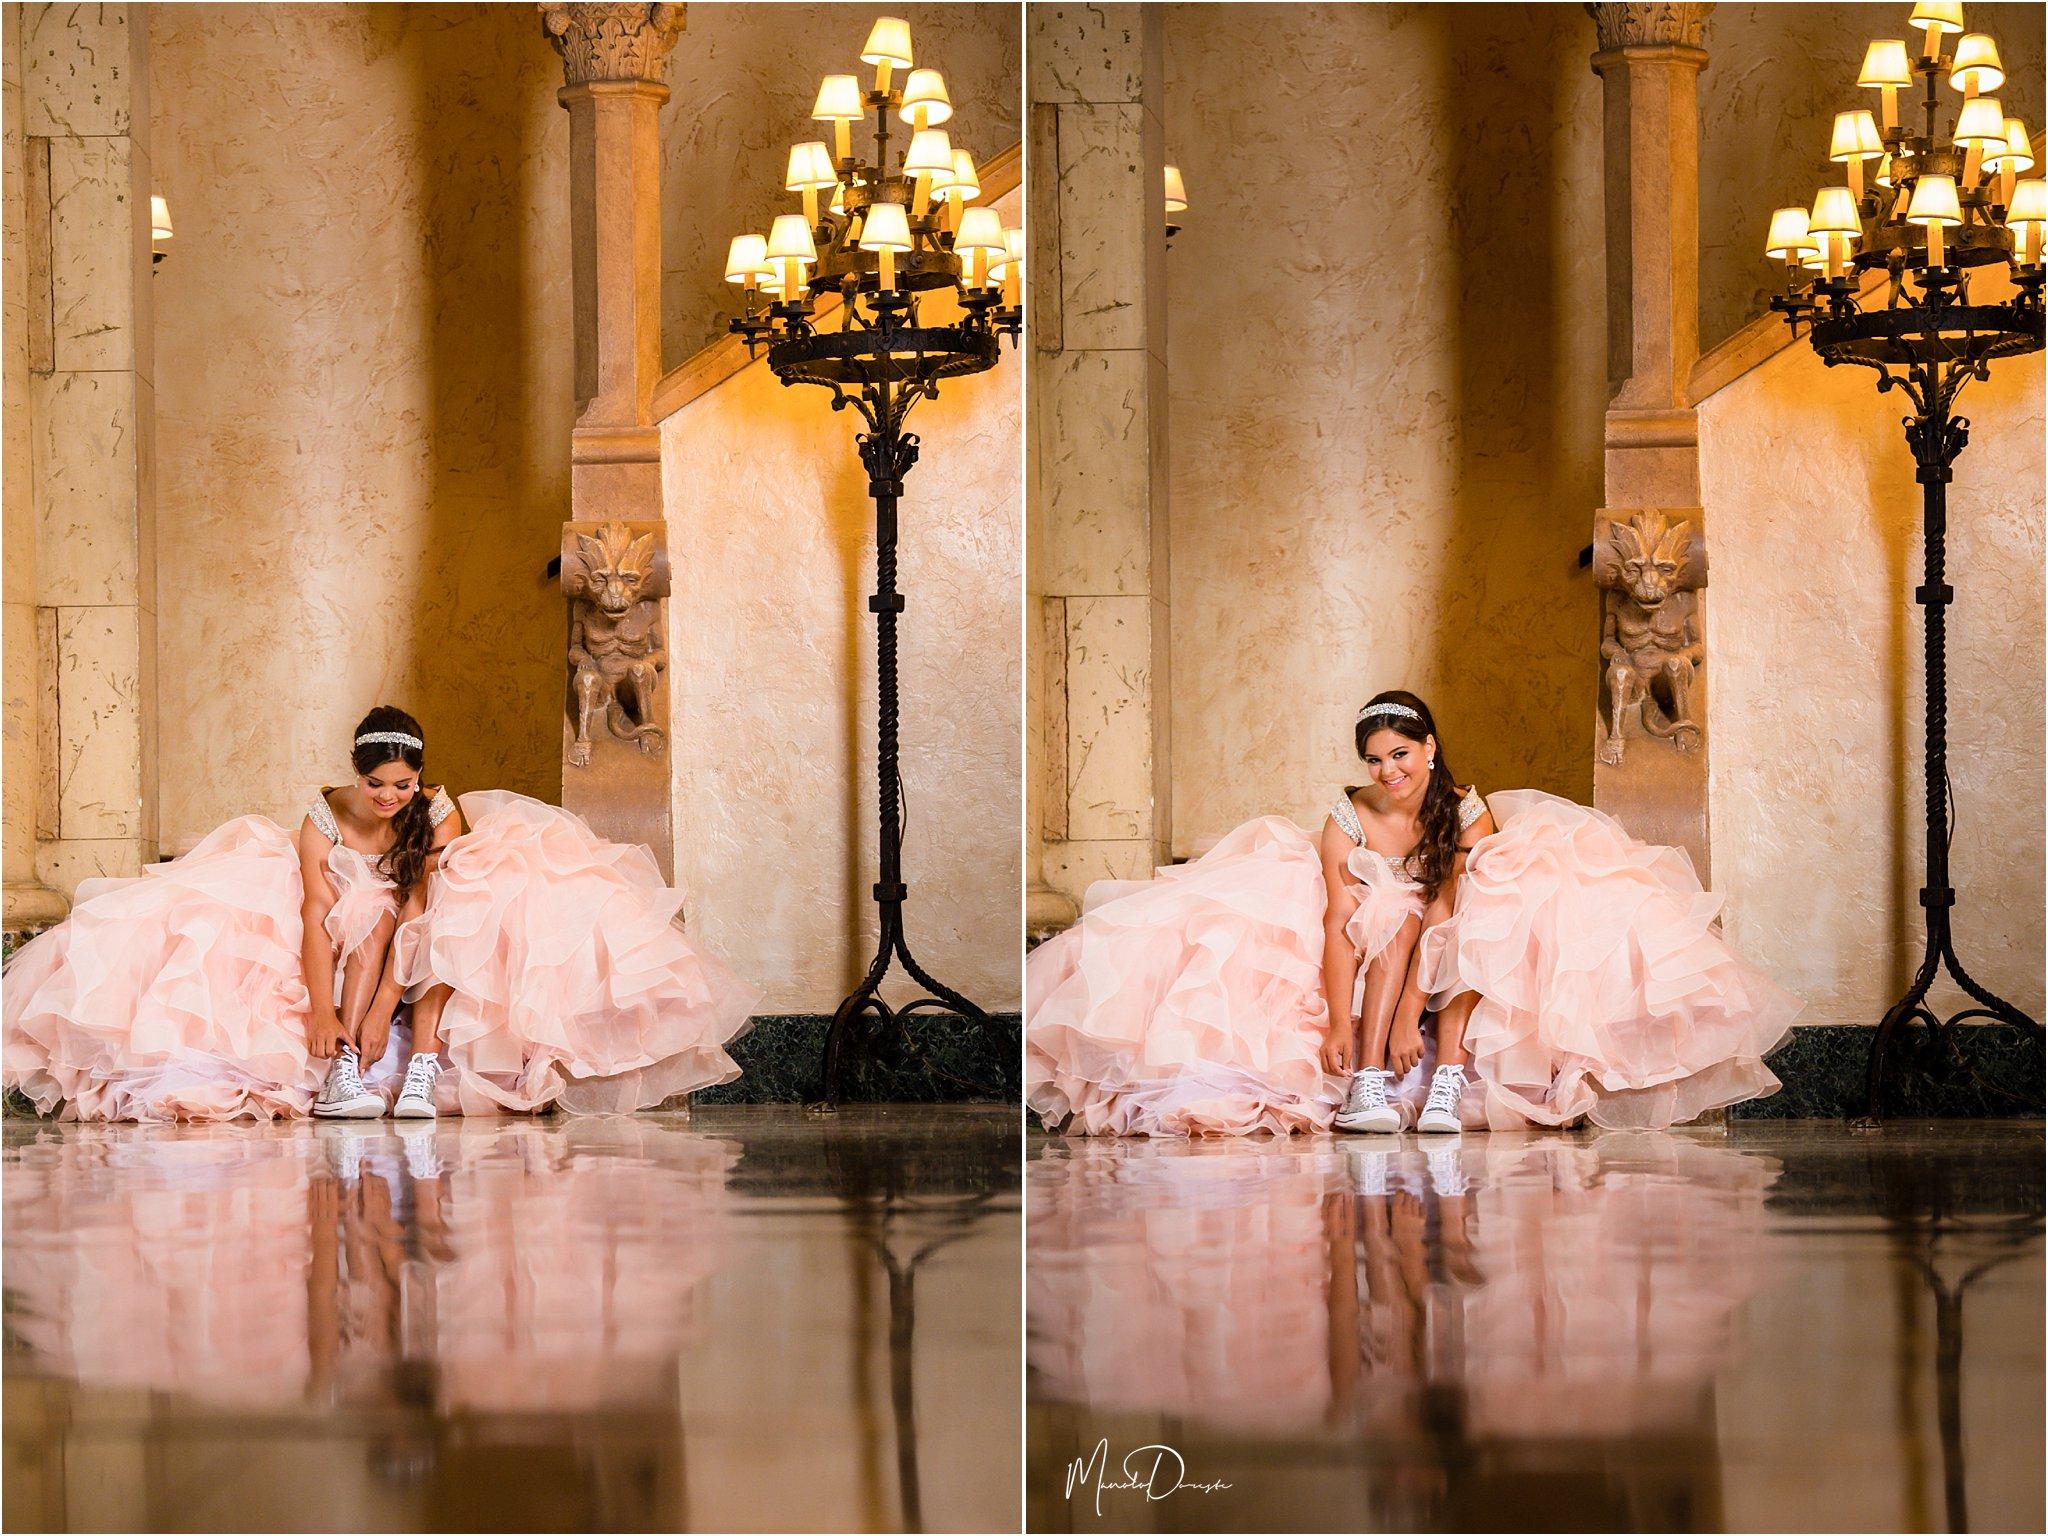 0351_ManoloDoreste_InFocusStudios_Wedding_Family_Photography_Miami_MiamiPhotographer.jpg